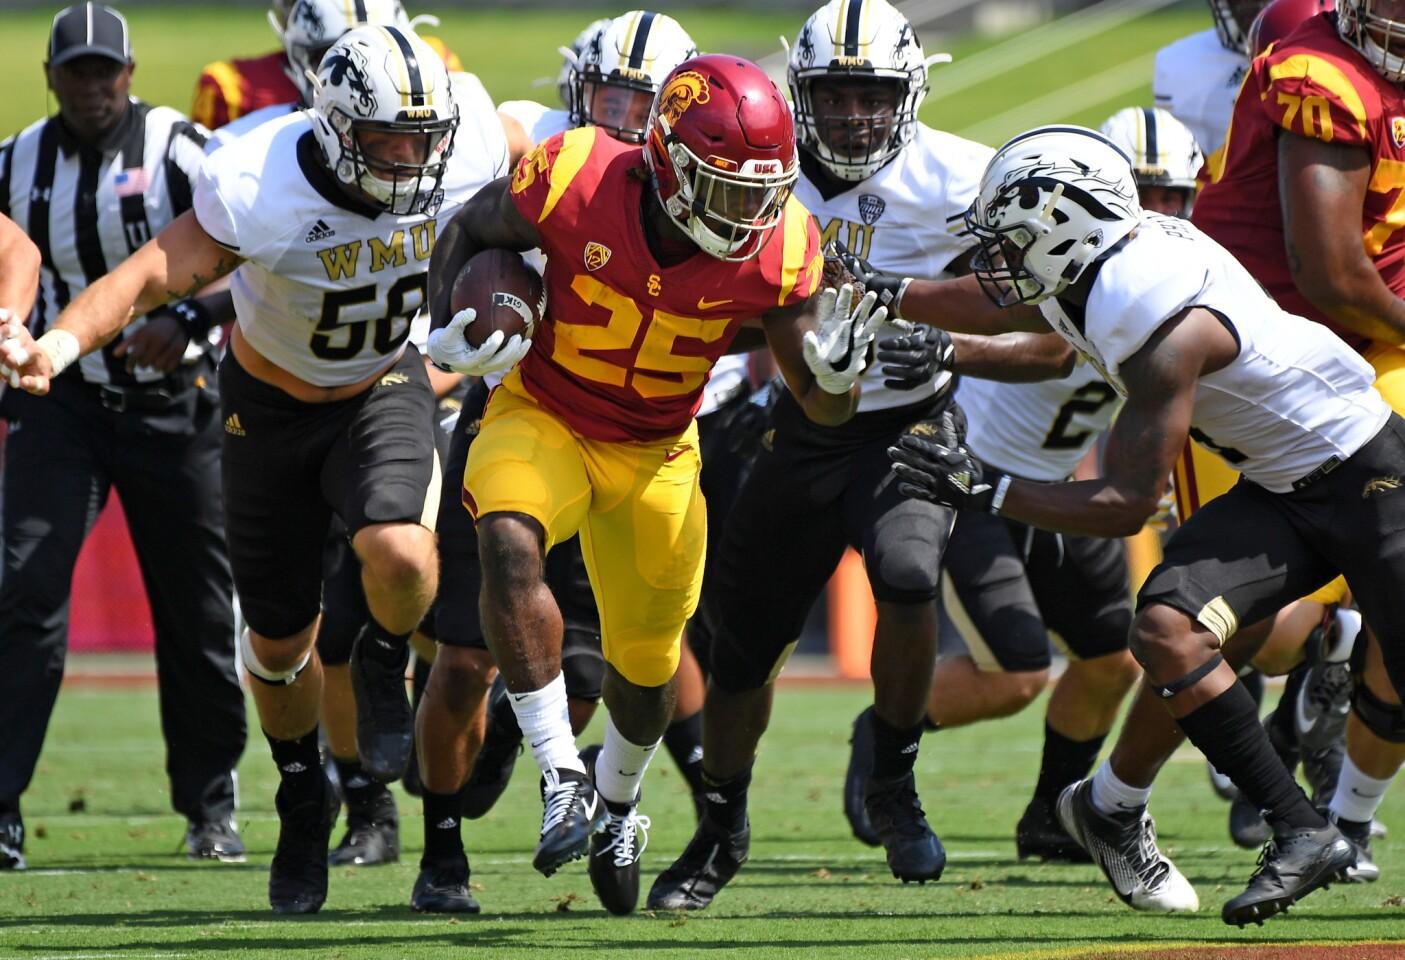 USC plays Western Michigan